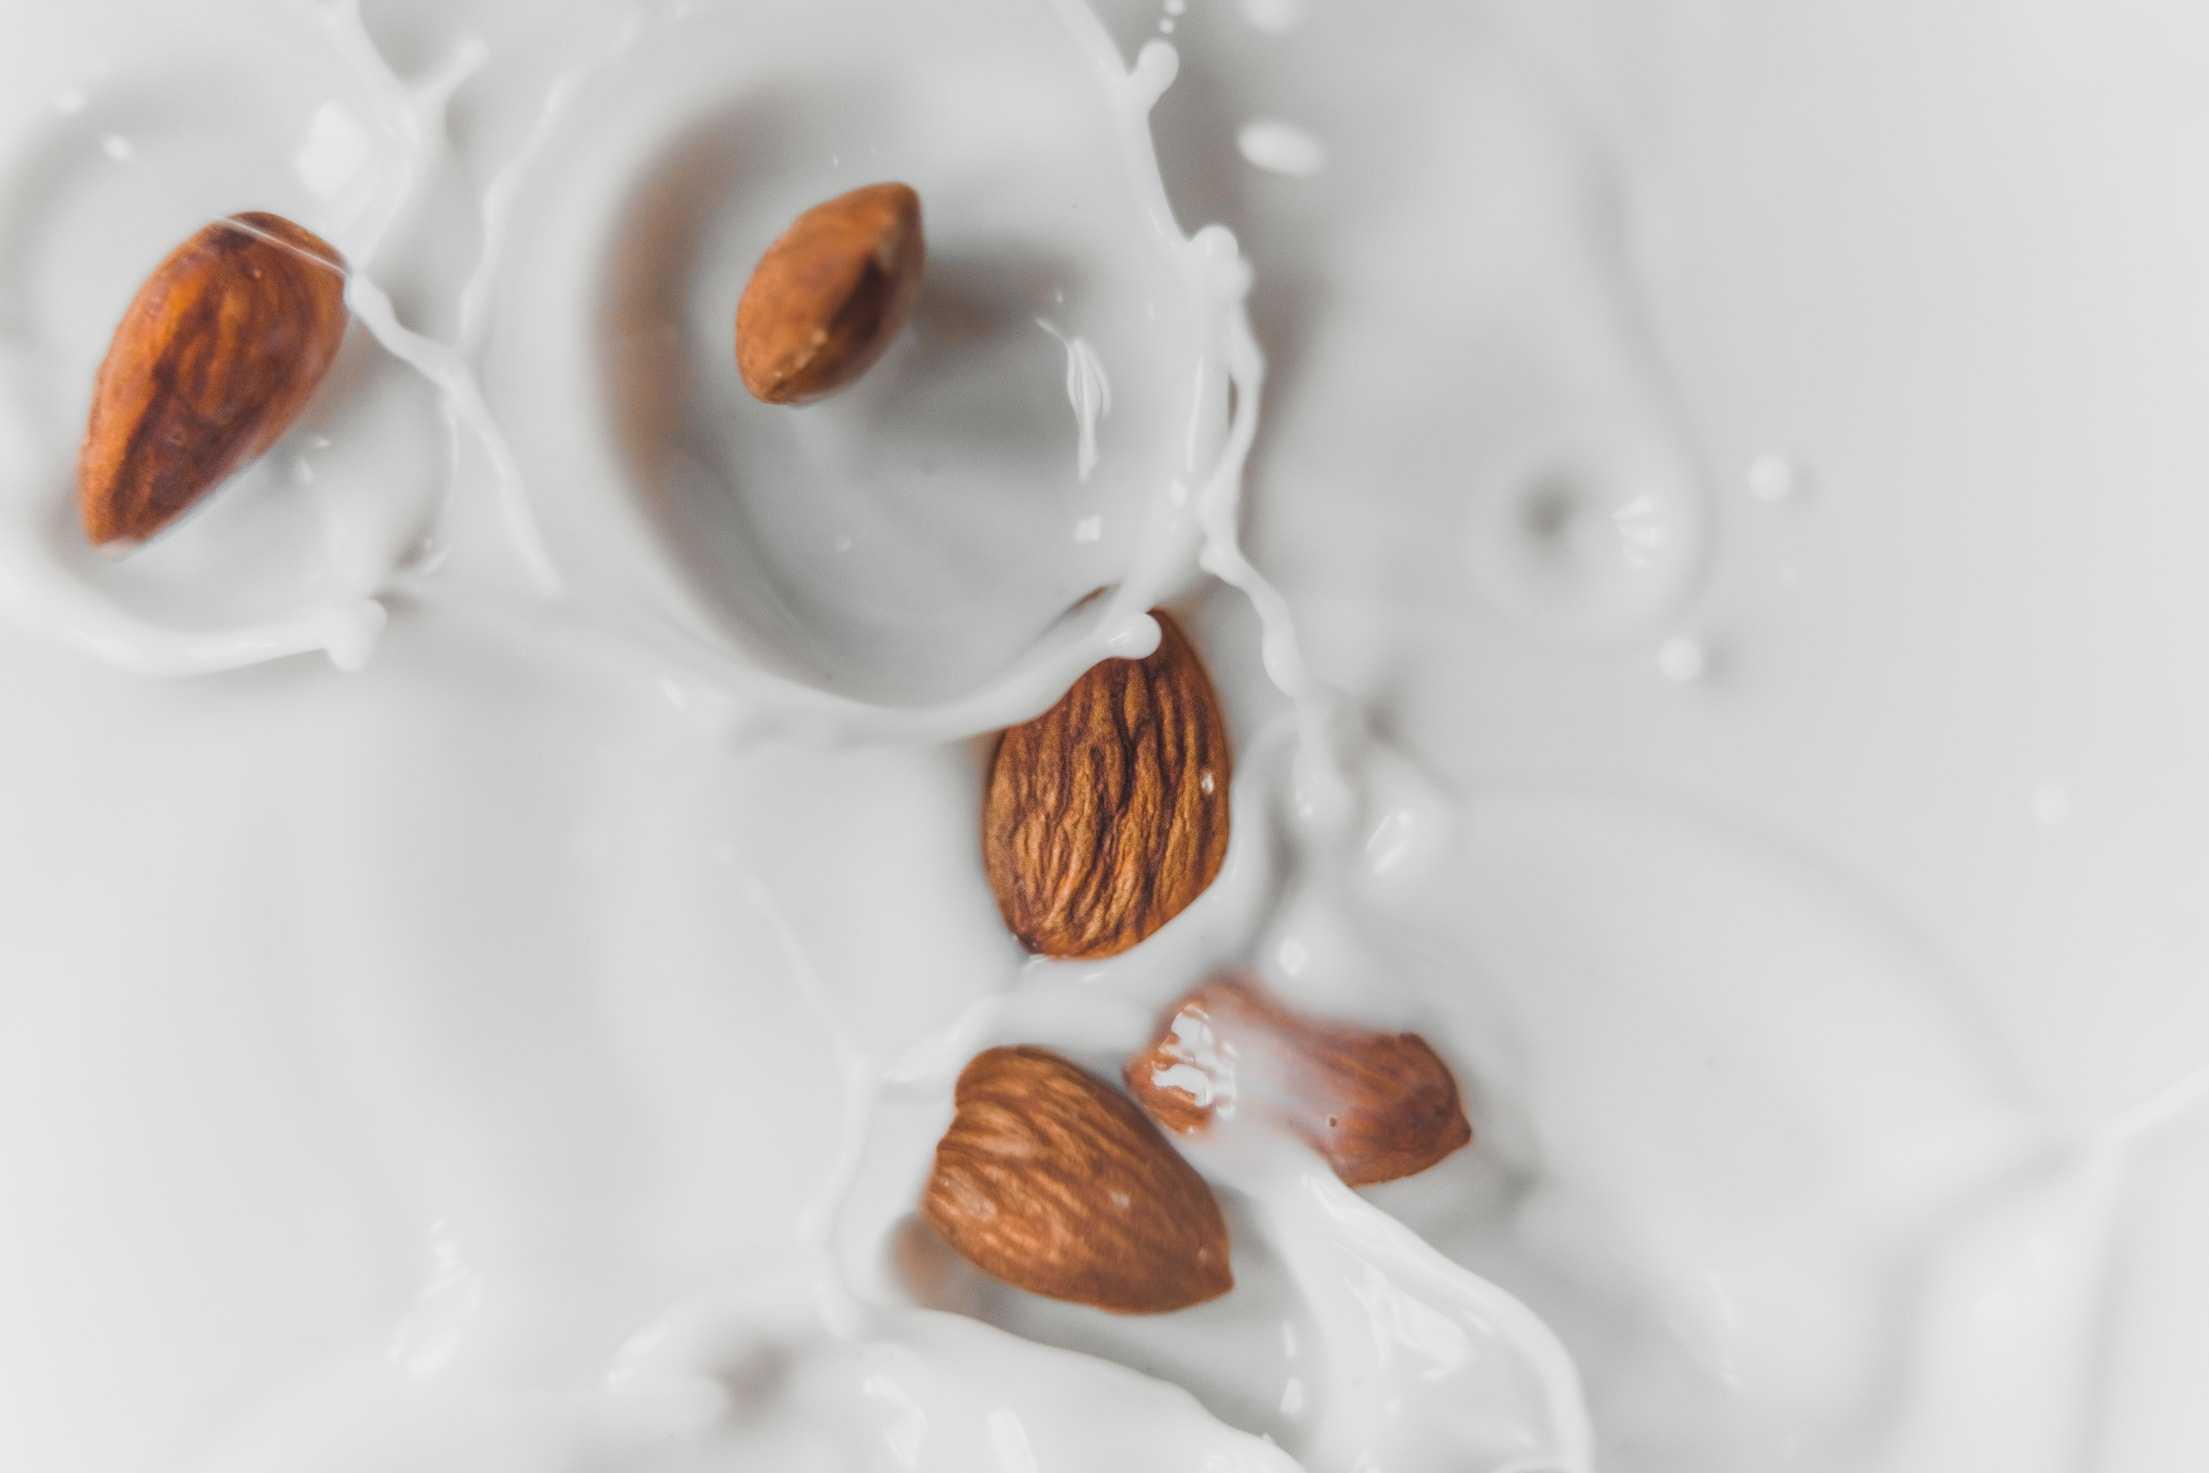 Almond milk with almonds. Plant-milk alternatives pose environmental questions